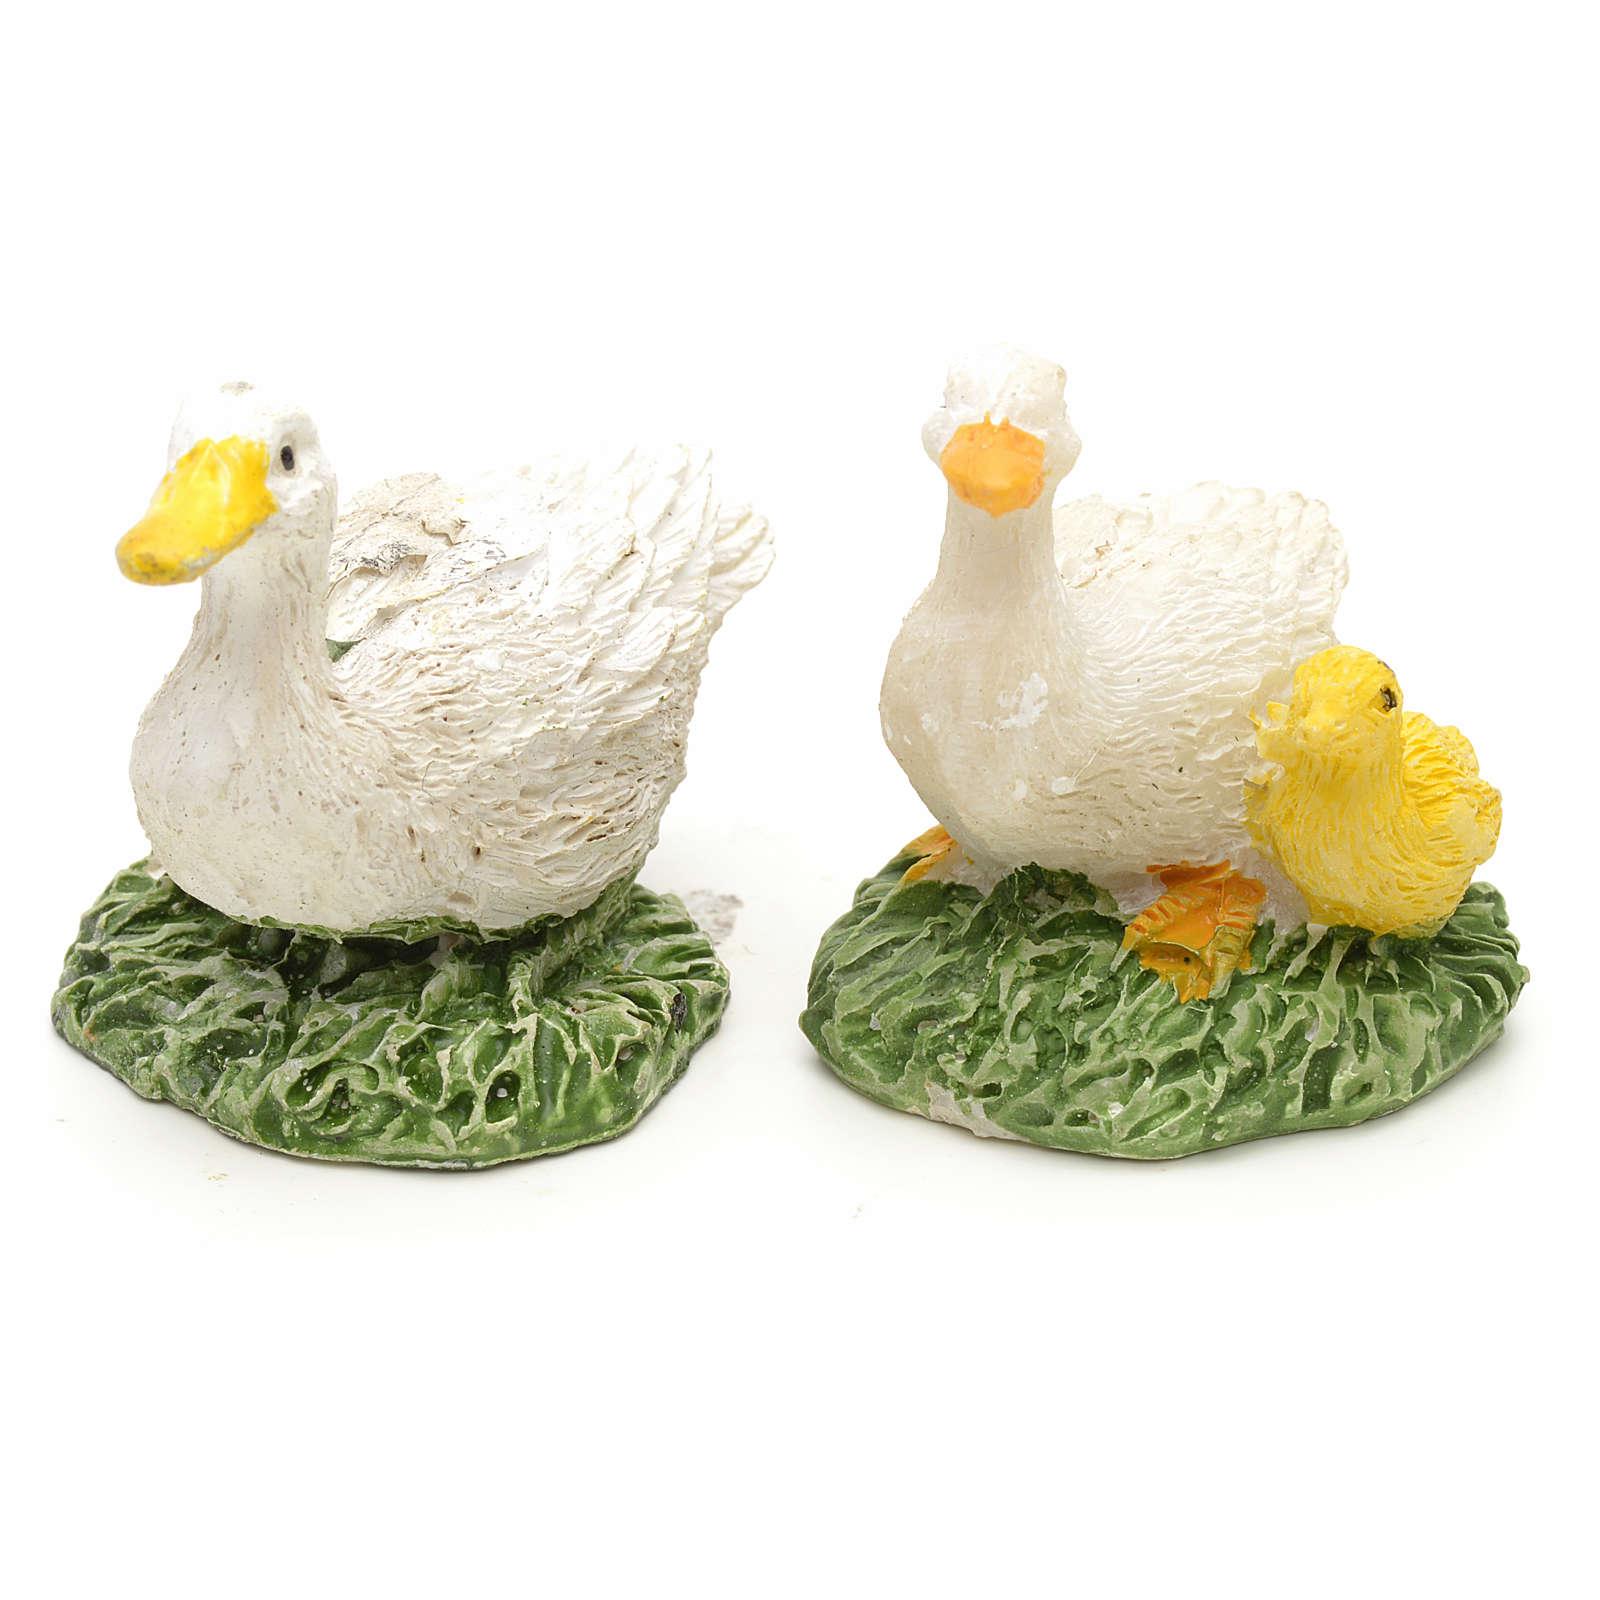 Nativity figurine, resin ducks, 2.5cm, set of 2 pcs 3